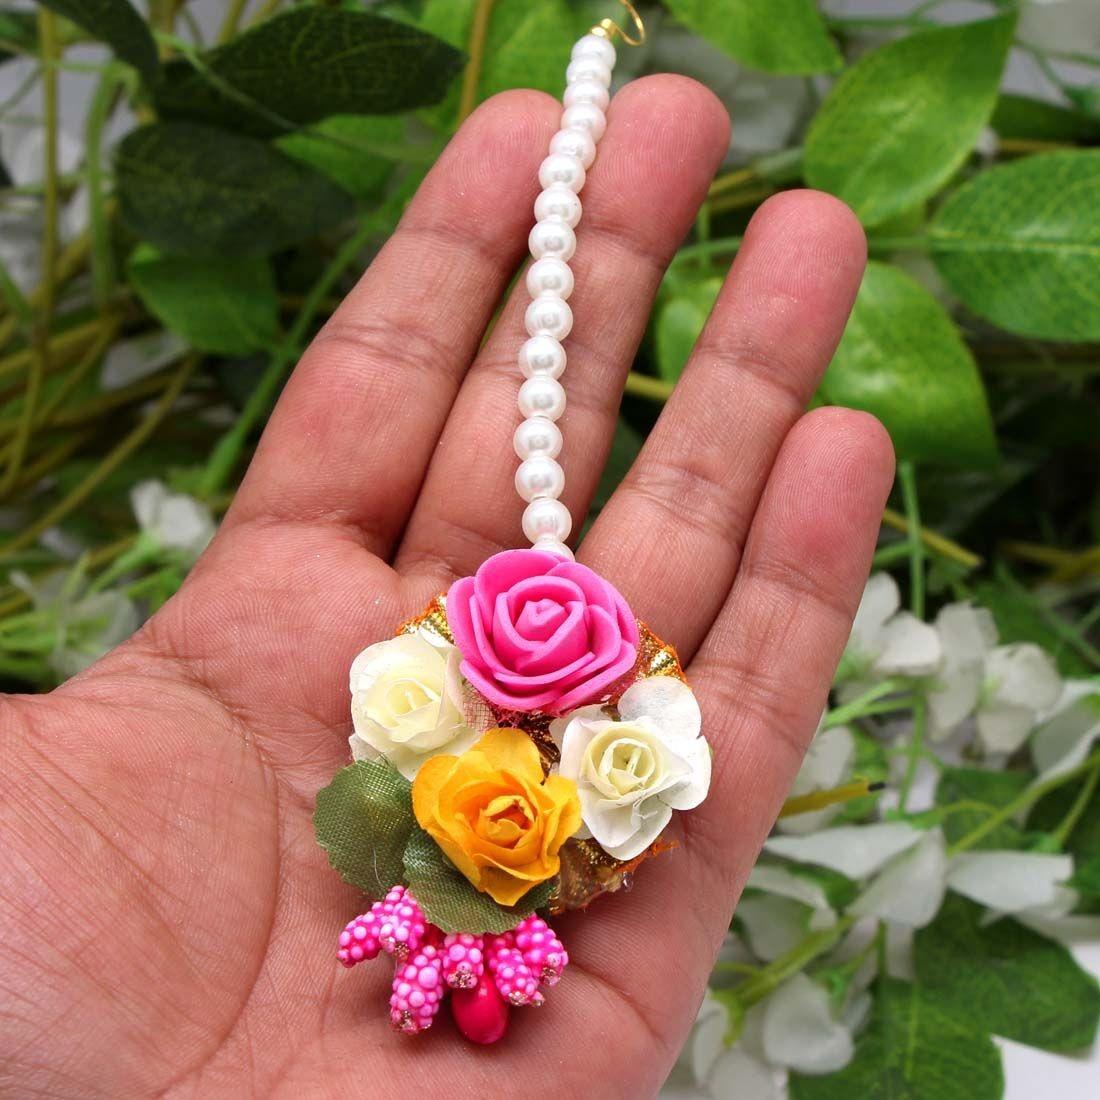 Tikka artesanal de flores